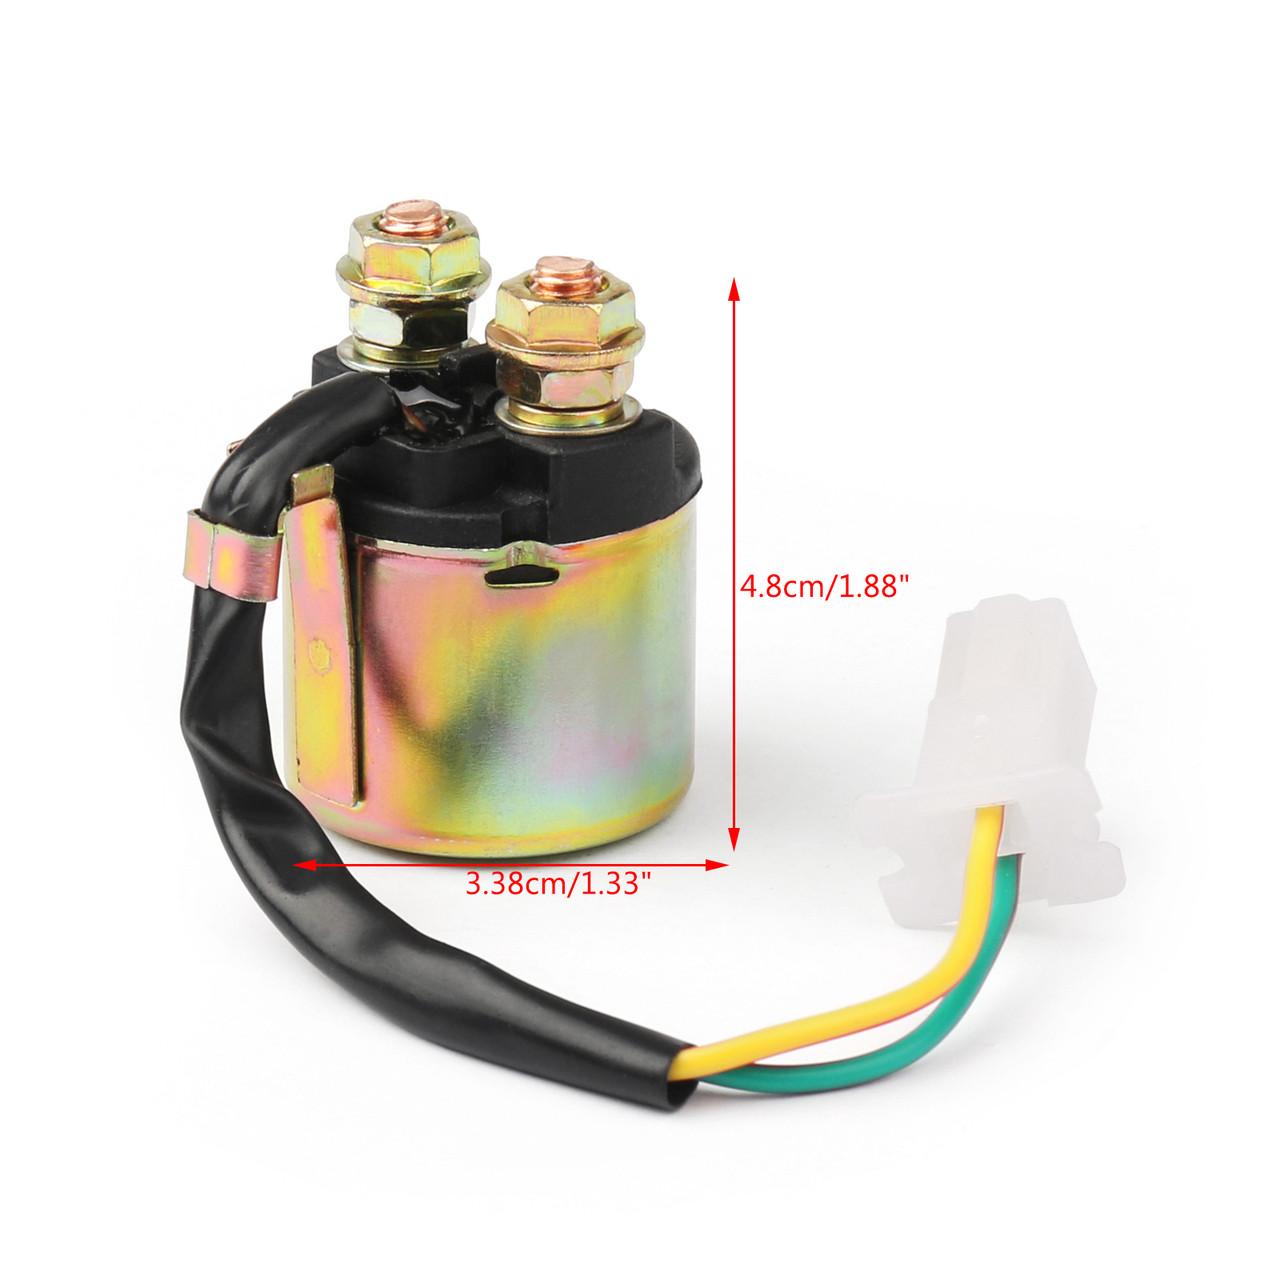 Starter Solenoid Relay Ignition For Honda TRX125 (85-86) ATC200 (82-84) TRX200 (84-87) TRX300 (88-00) TRX300FW FourTrax 300 (88-00)